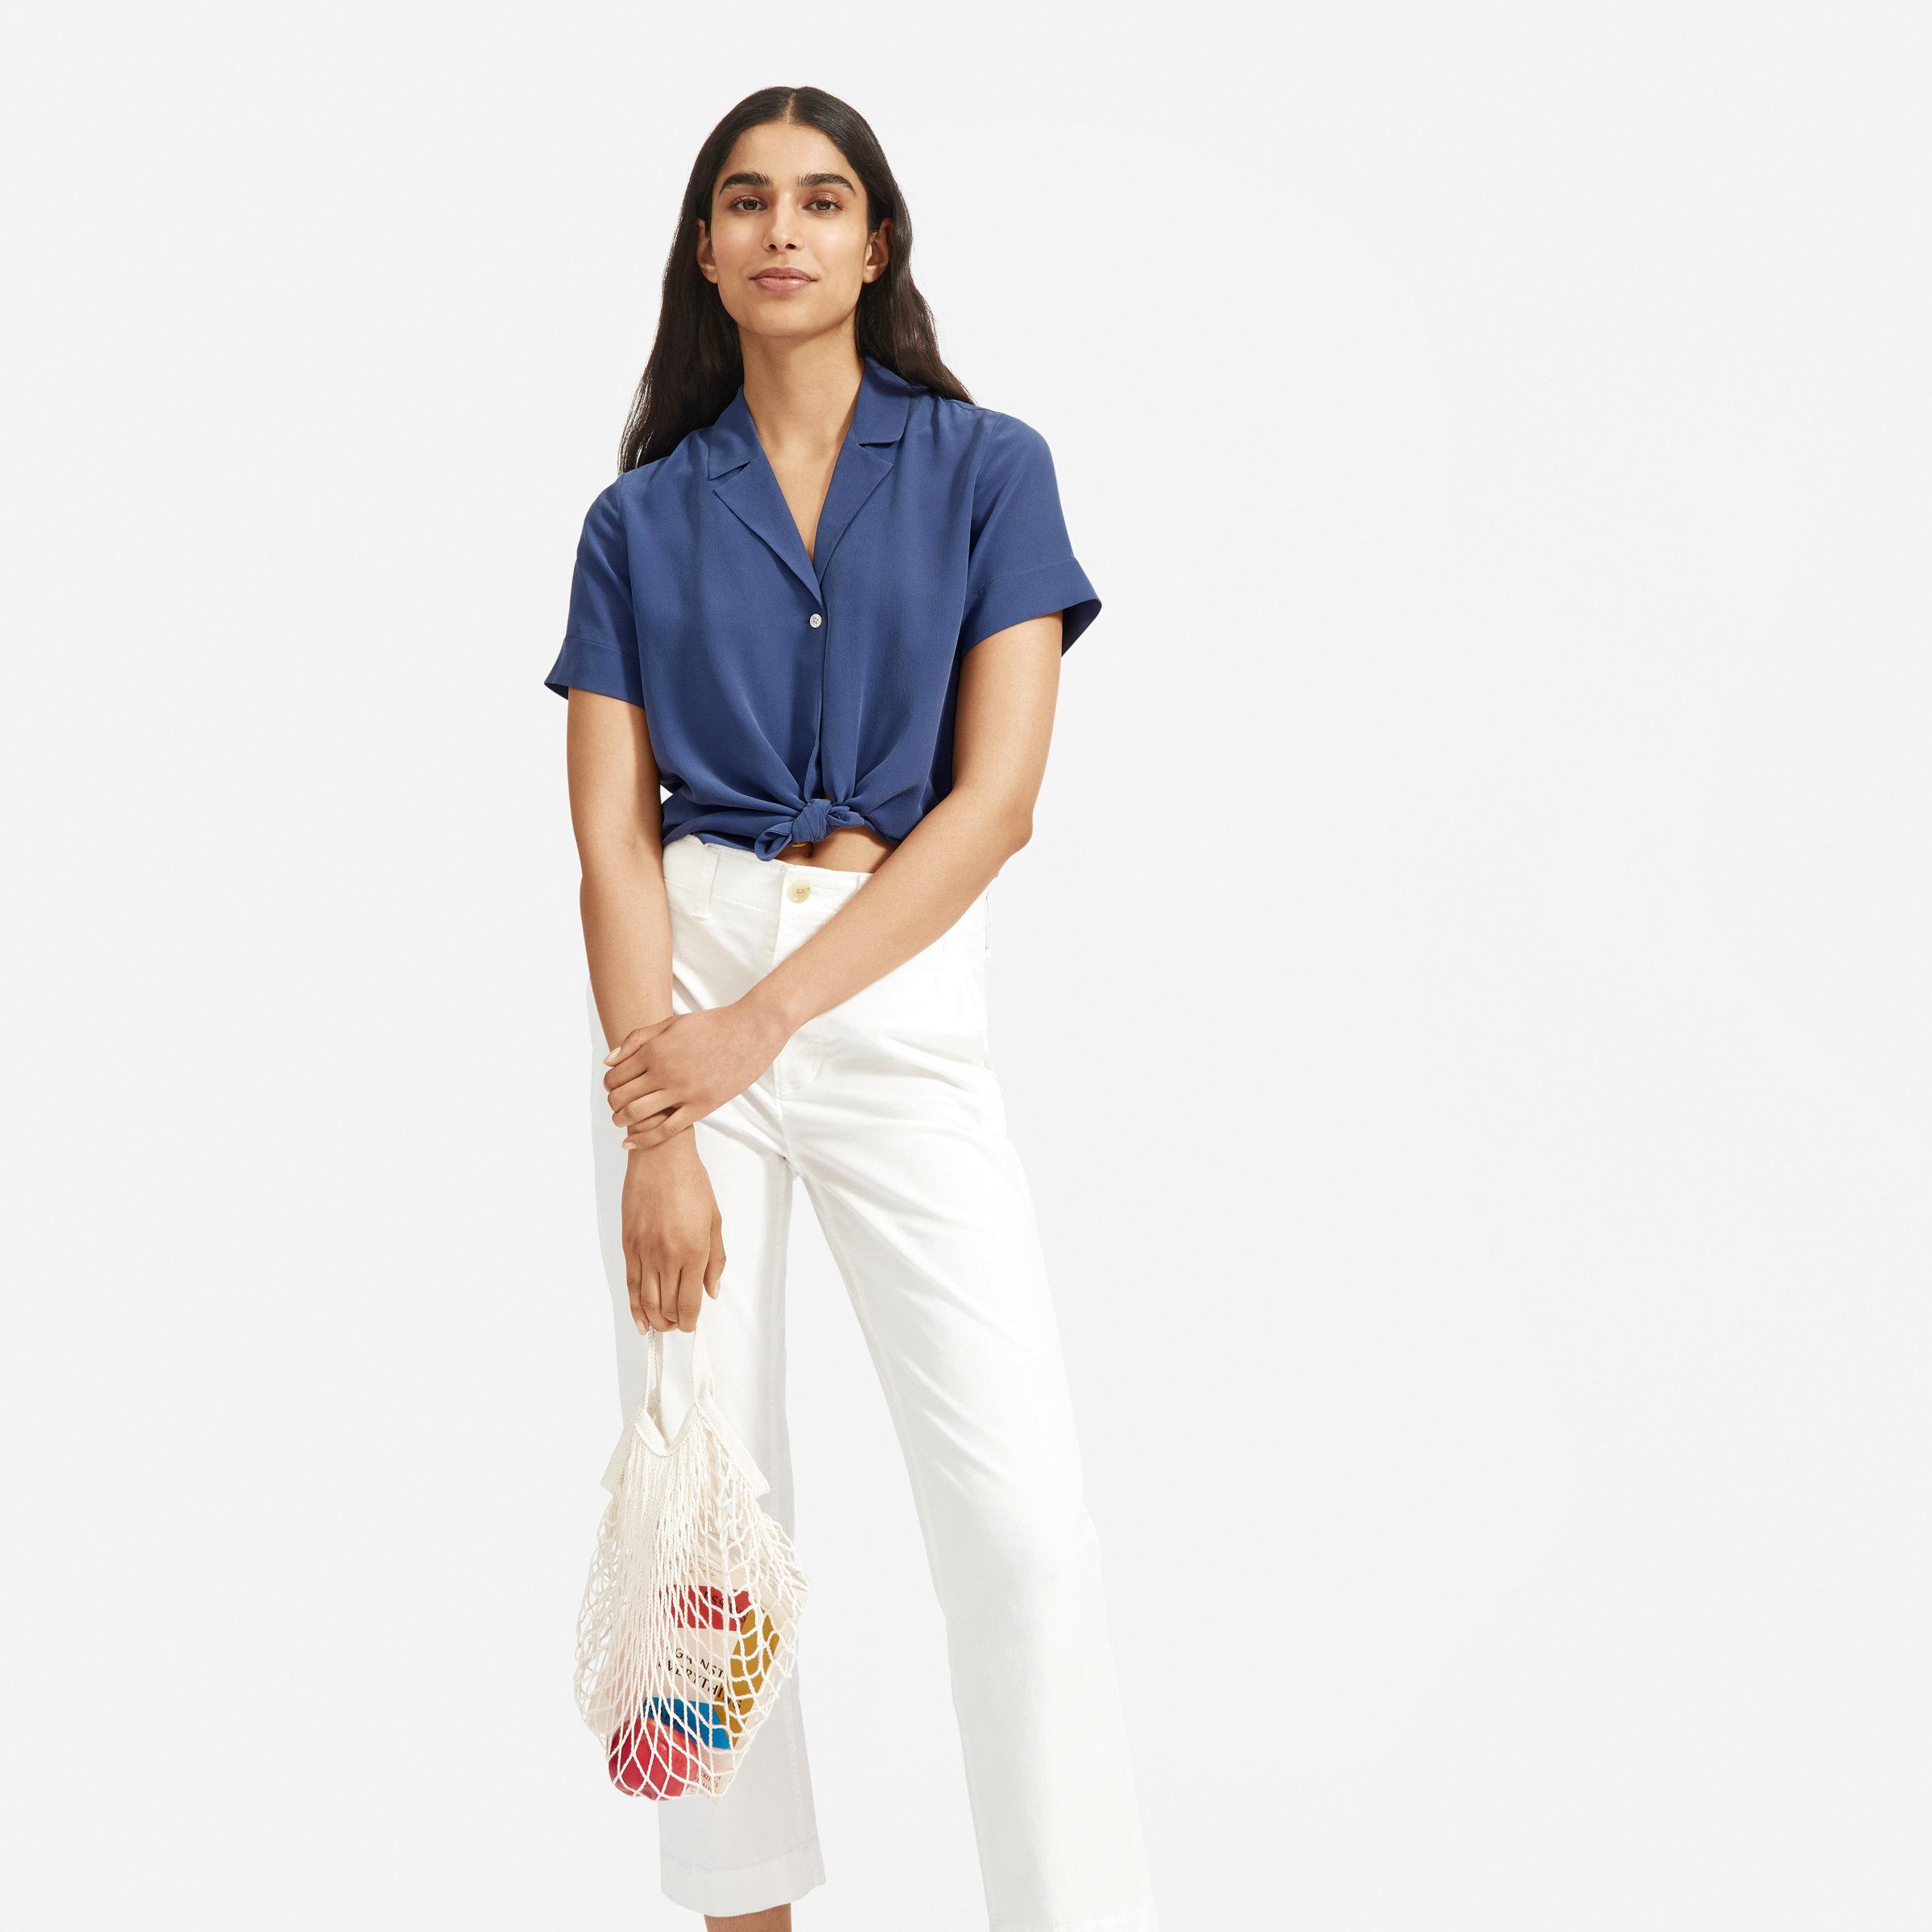 888abf6f1dc Women's Shirts, Tops & Silk Blouses | Everlane